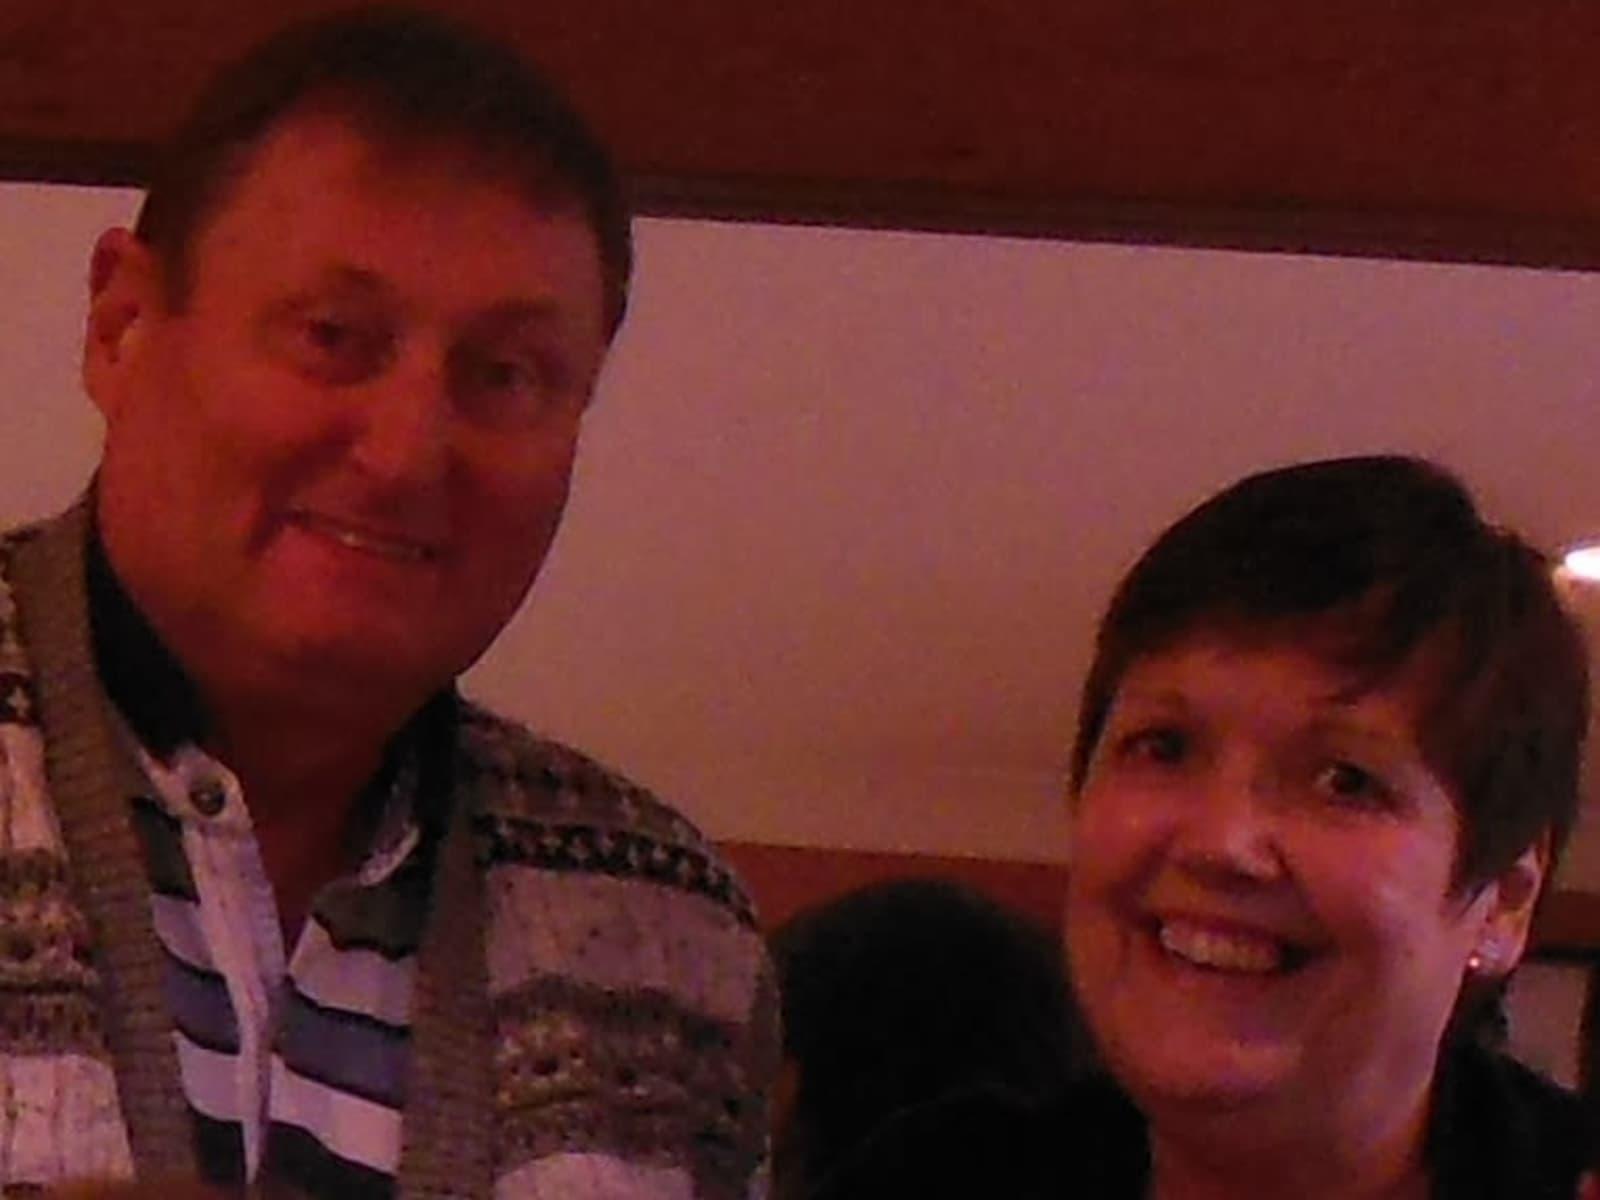 Rosemary & Peter from Fuengirola, Spain